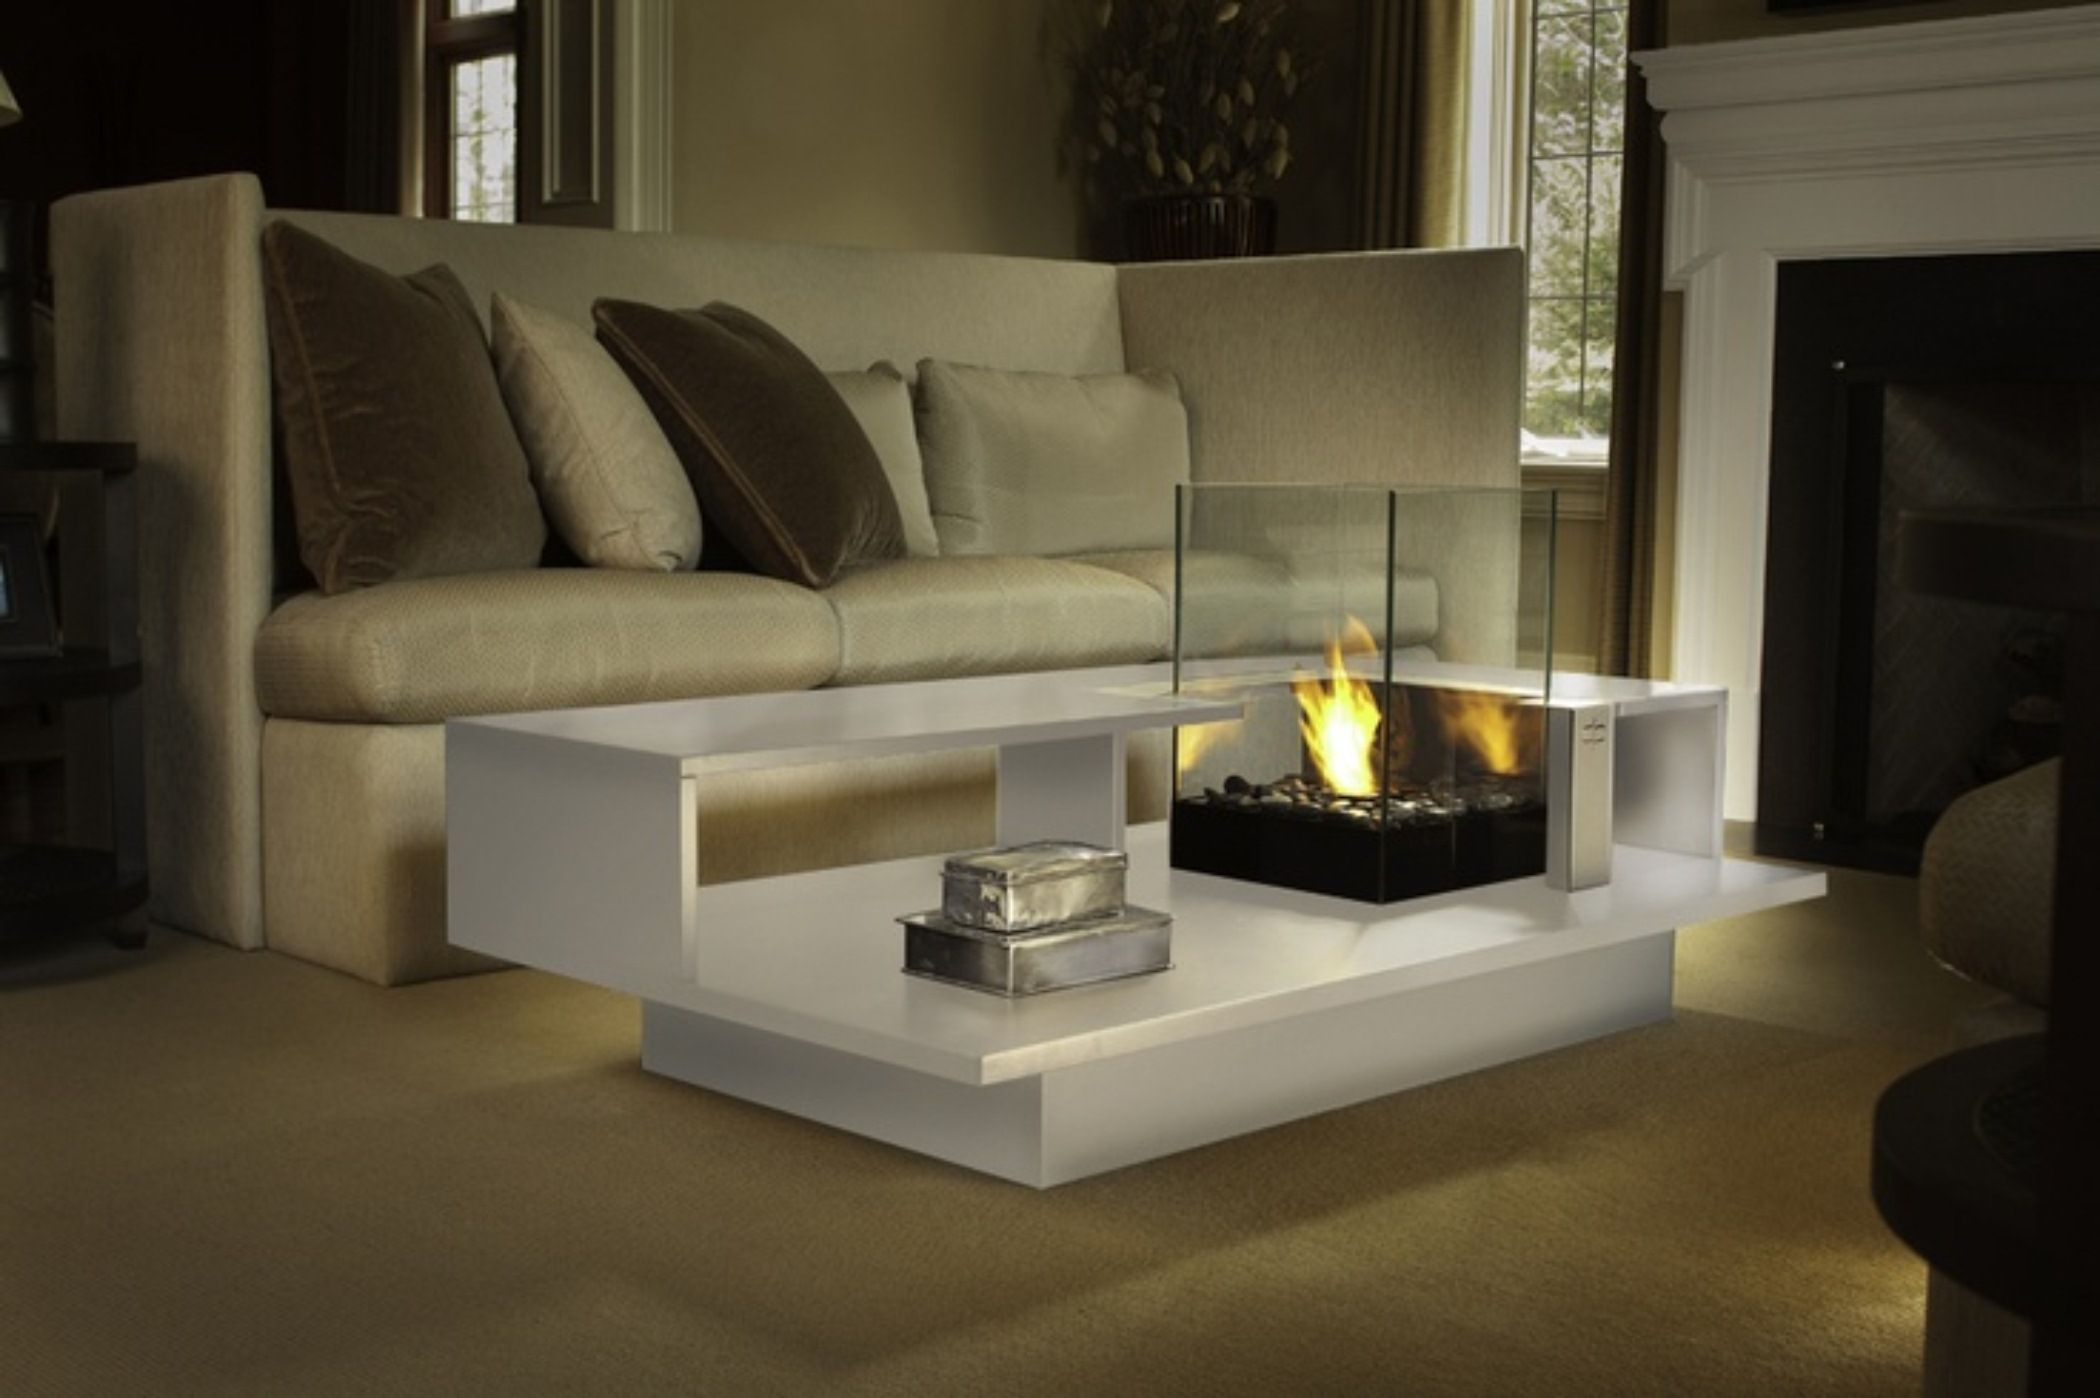 Building An Indoor Fire Pit Living Room Coffee Table Indoor